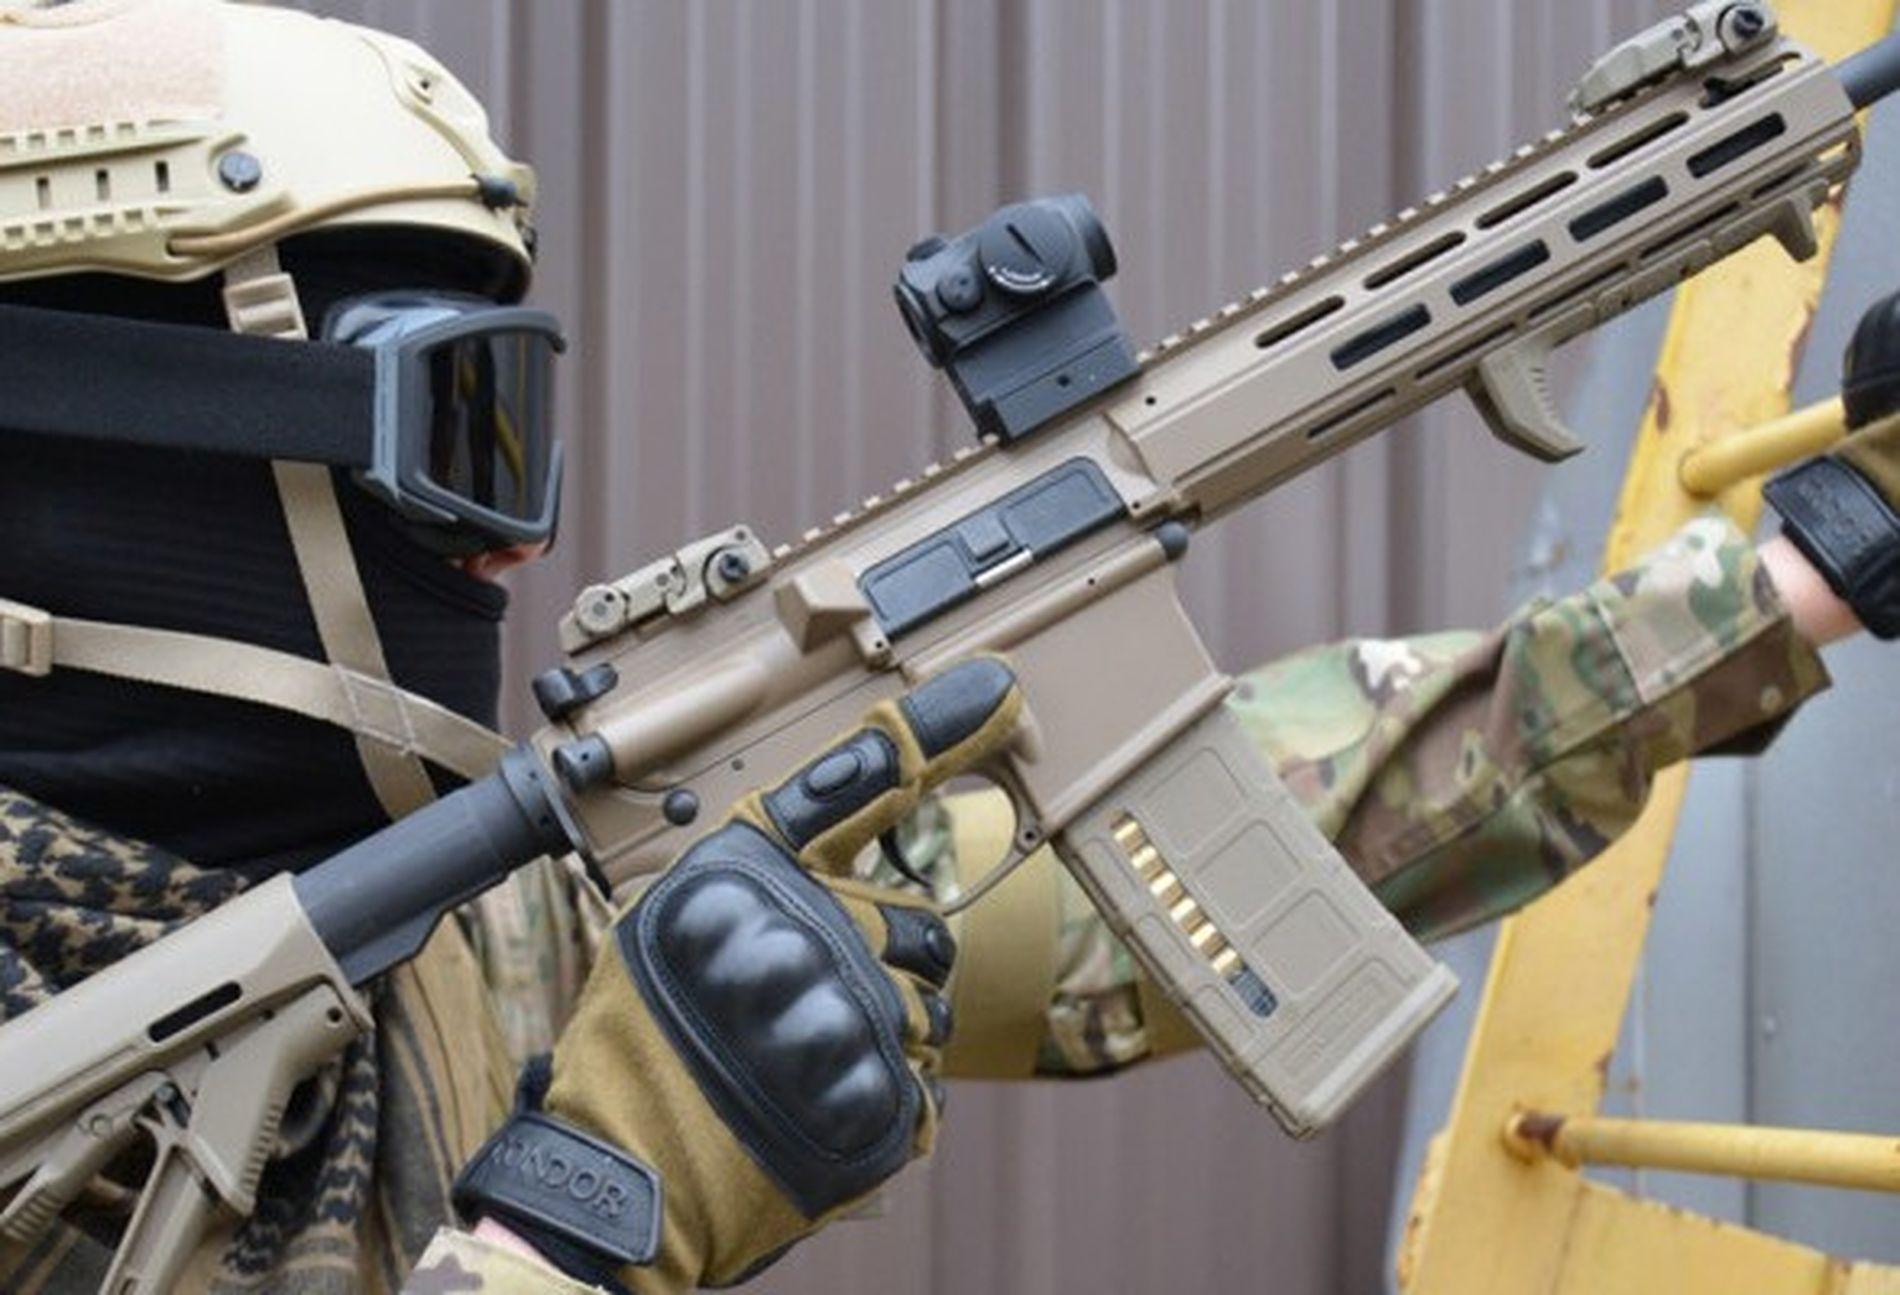 Kanada hoče ozbroїty ukraїnśku armiju svoїmy gvyntivkamy